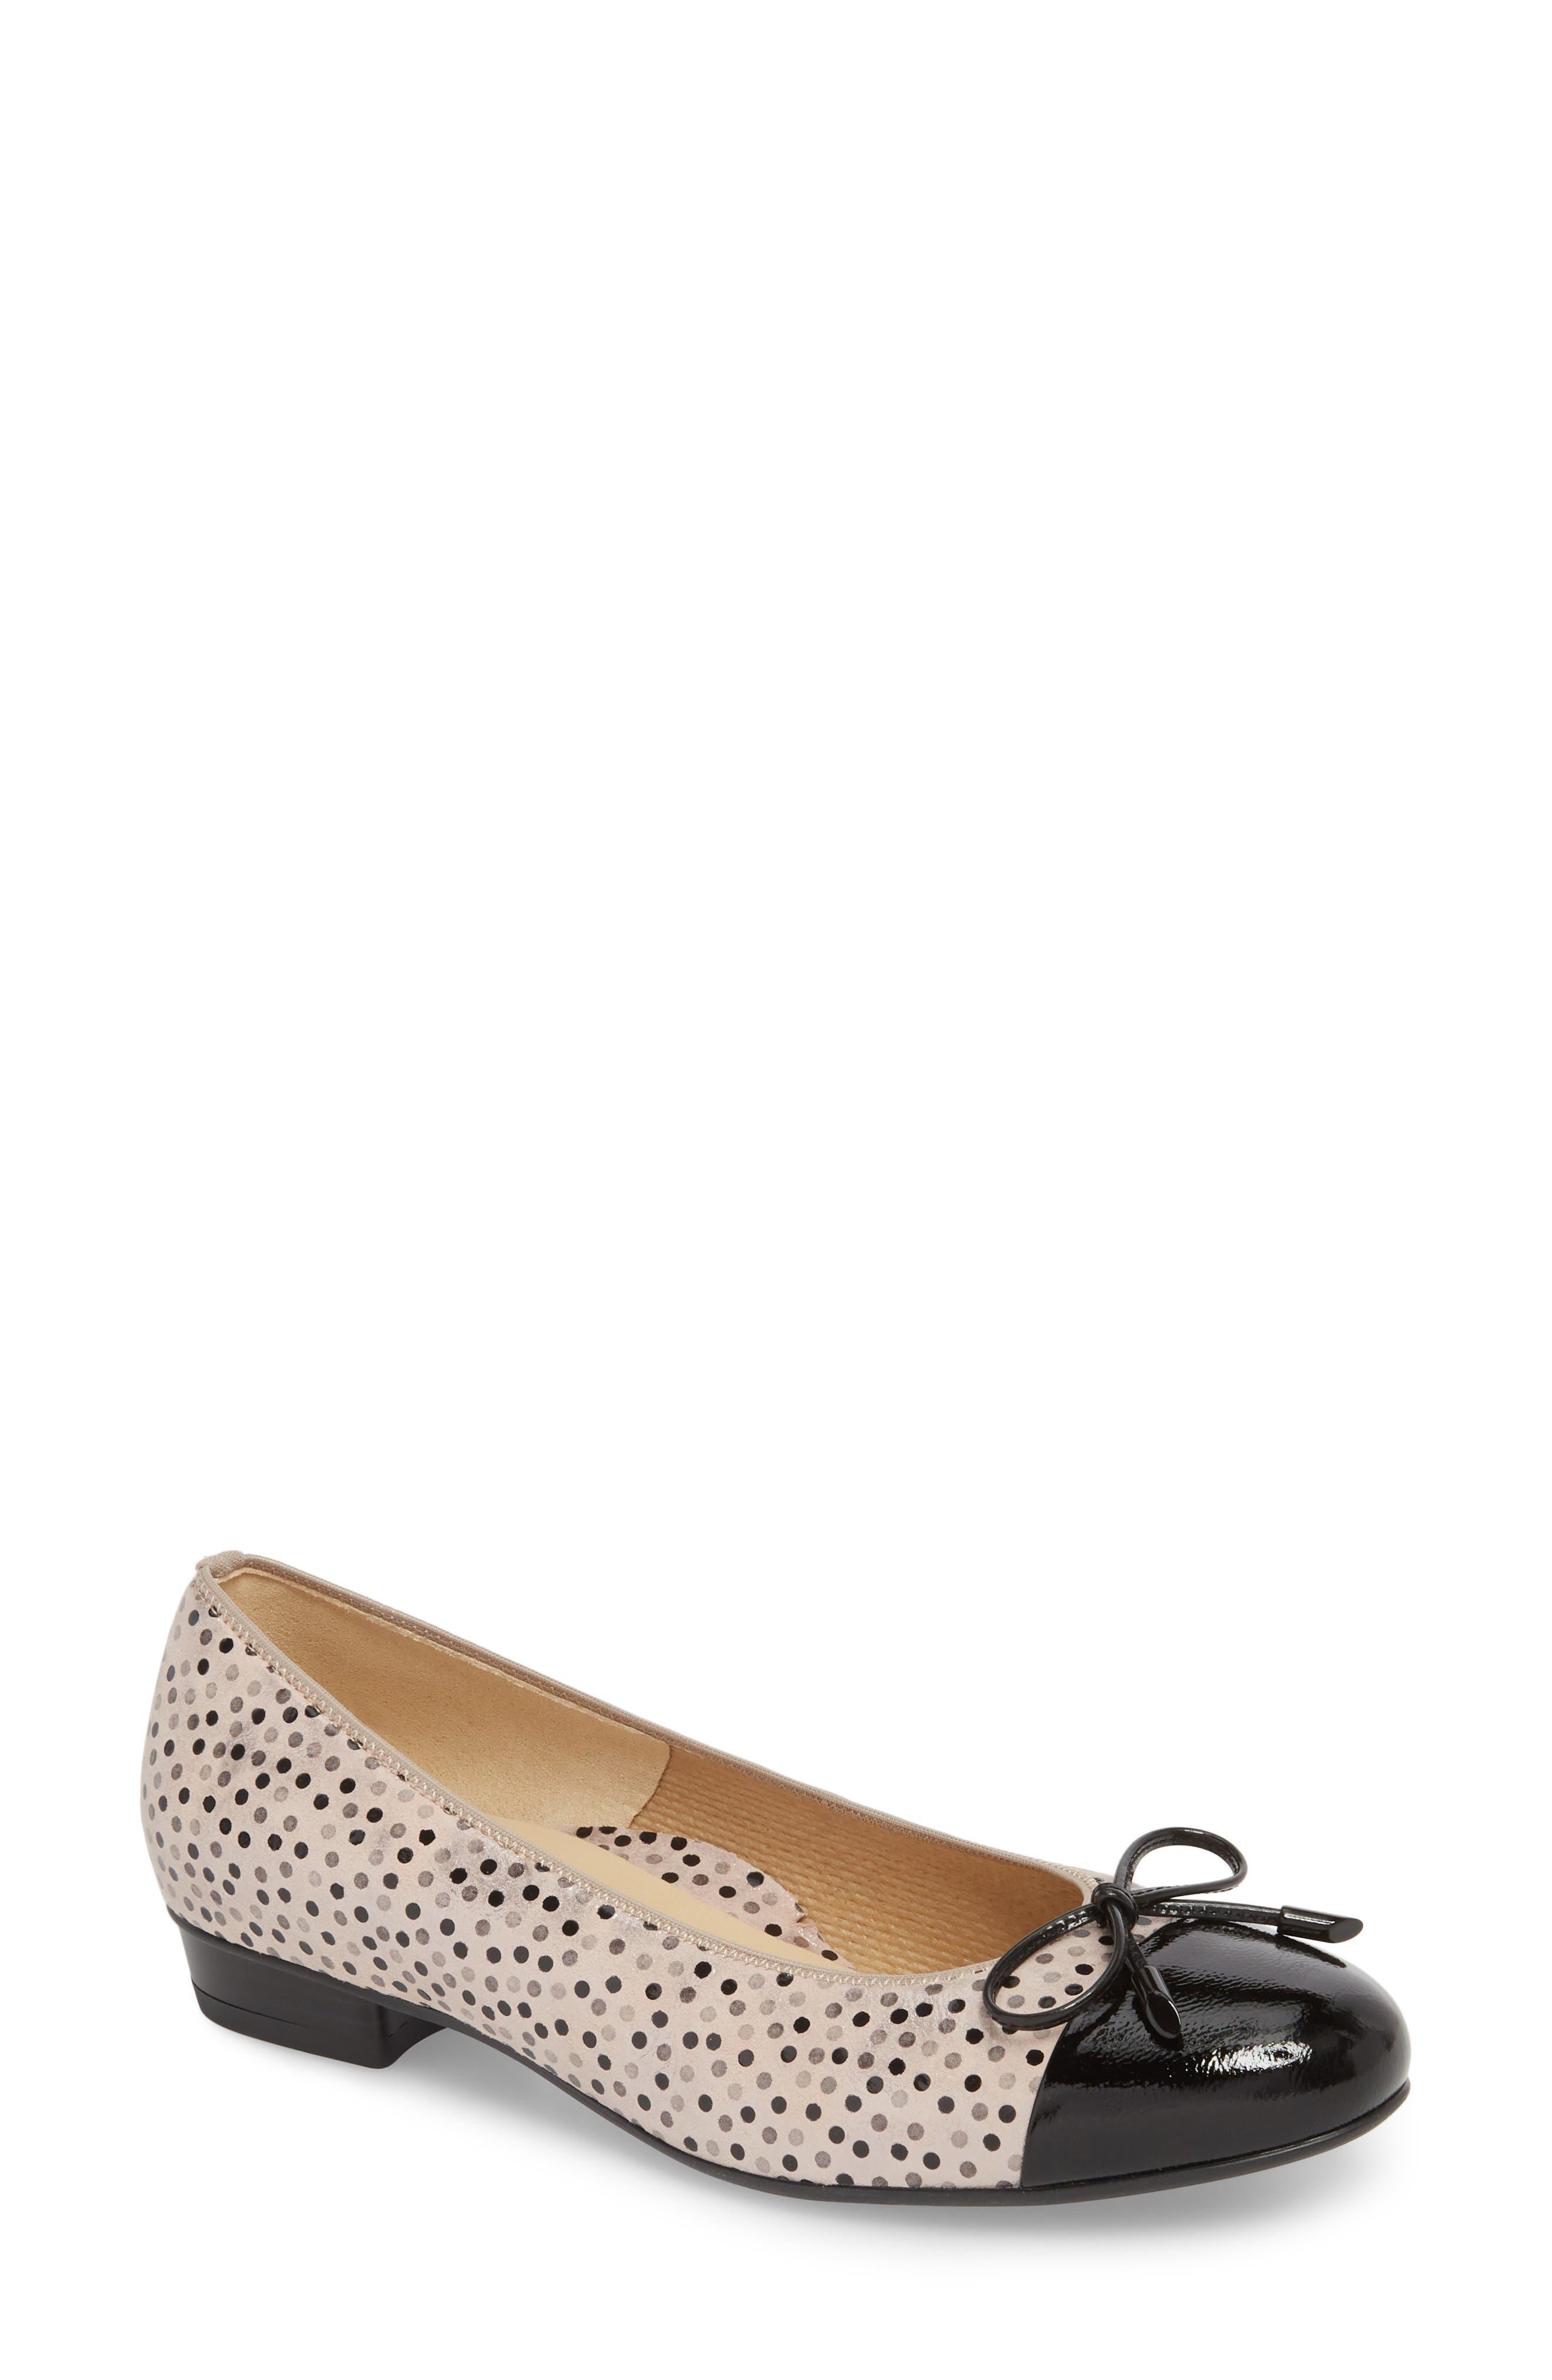 'Betty' Cap Toe Flat,                         Main,                         color, Black Polka Dot Leather